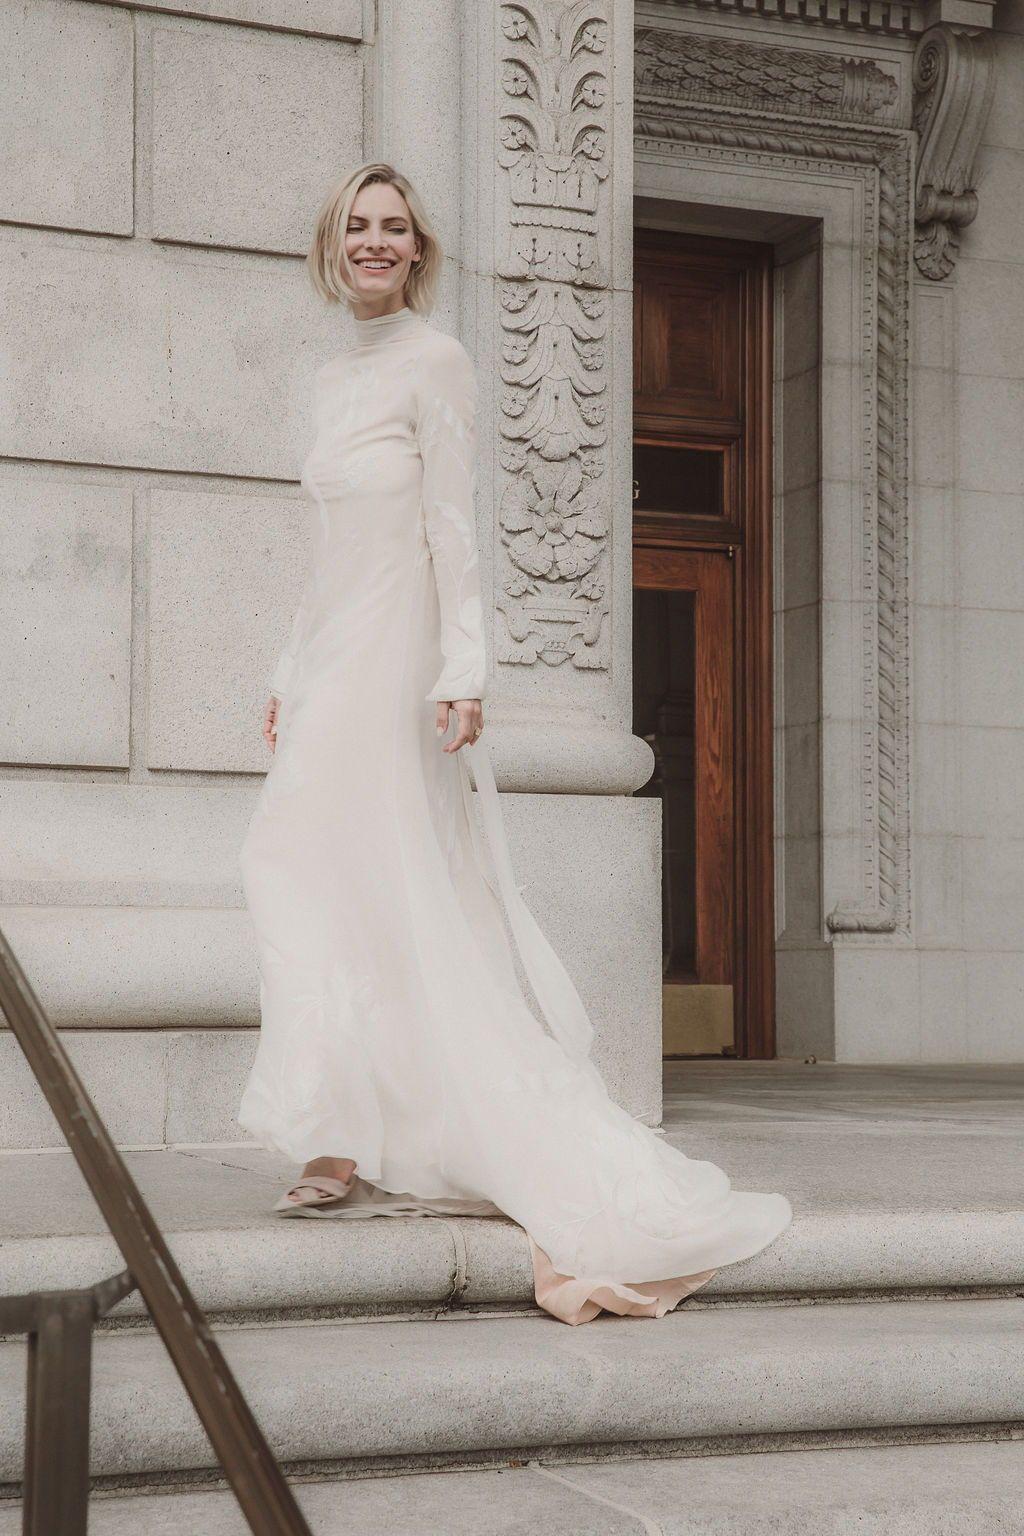 41++ Turtleneck wedding dress no sleeves information